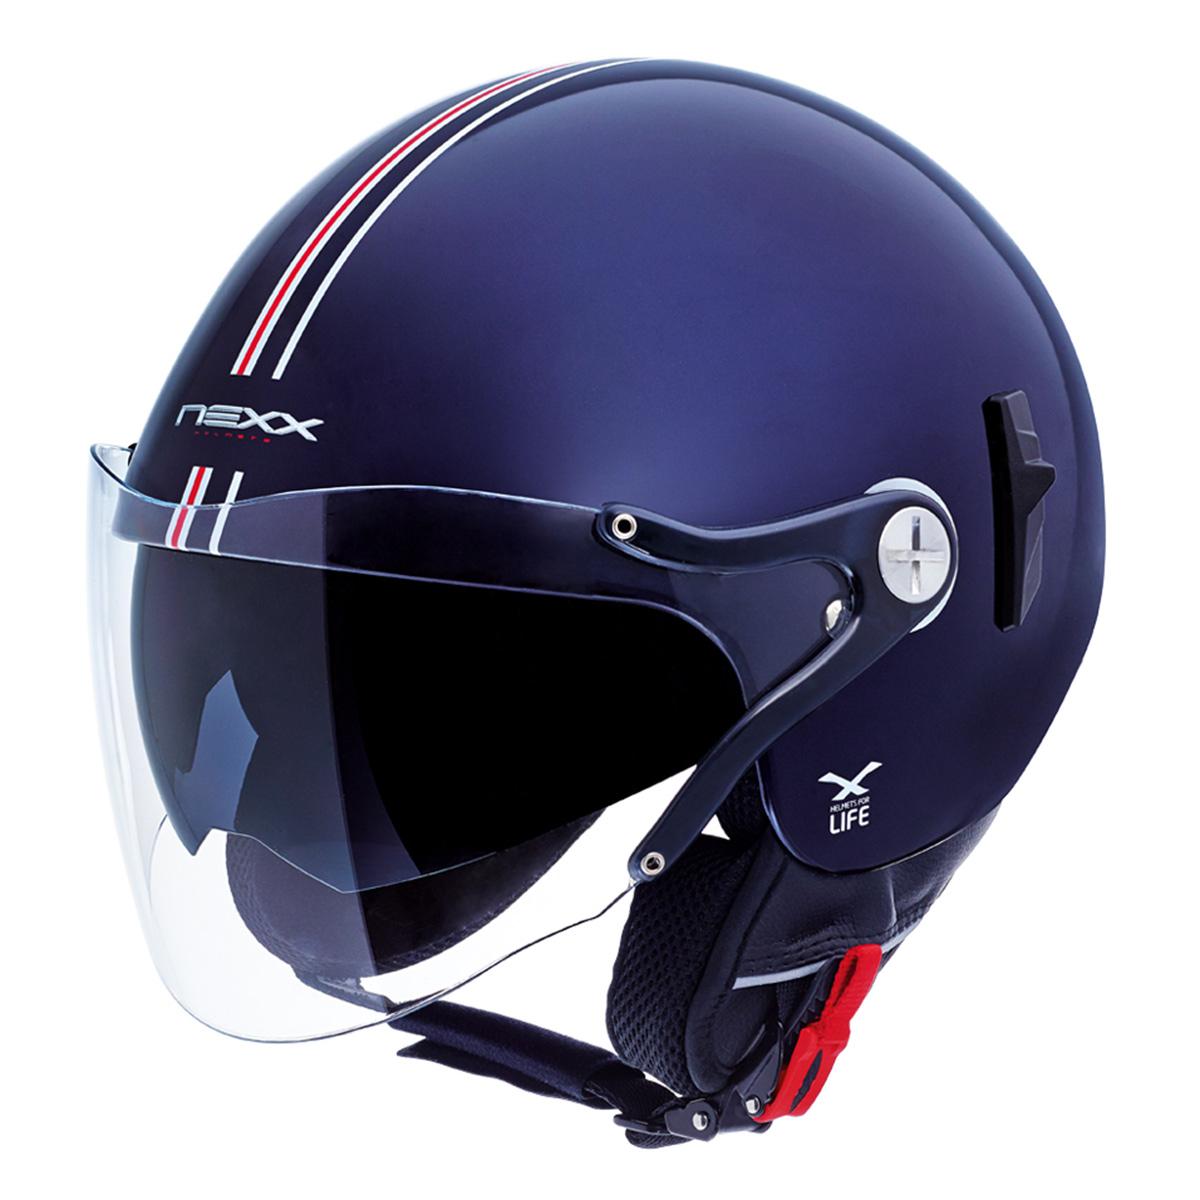 Capacete Nexx X60 Bastille Azul C/ Viseira solar NOVO!  - Planet Bike Shop Moto Acessórios